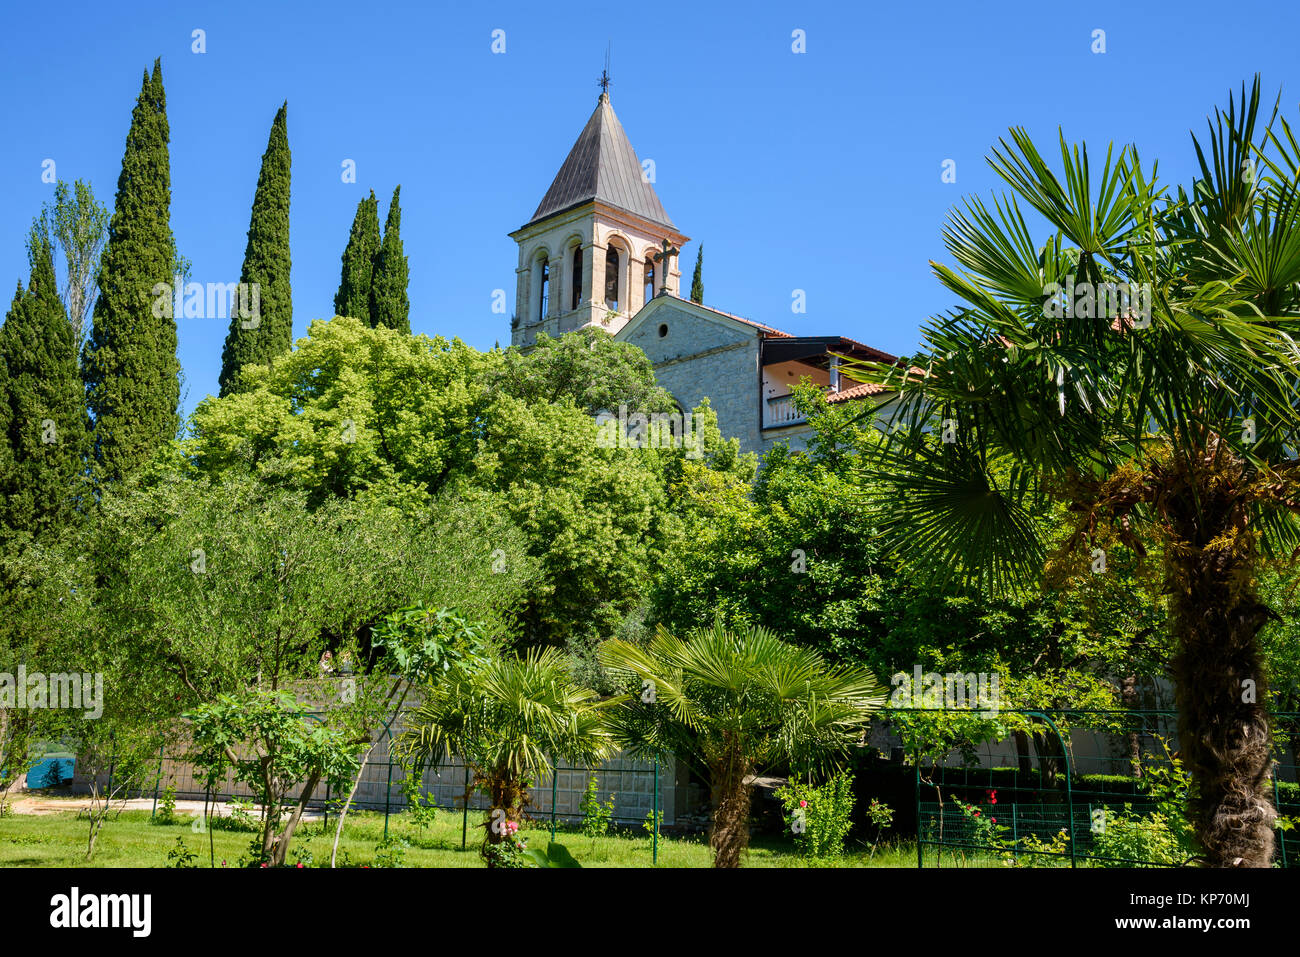 Kloster auf der Insel Visovac, Nationalpark Krka, Kroatien Stockbild